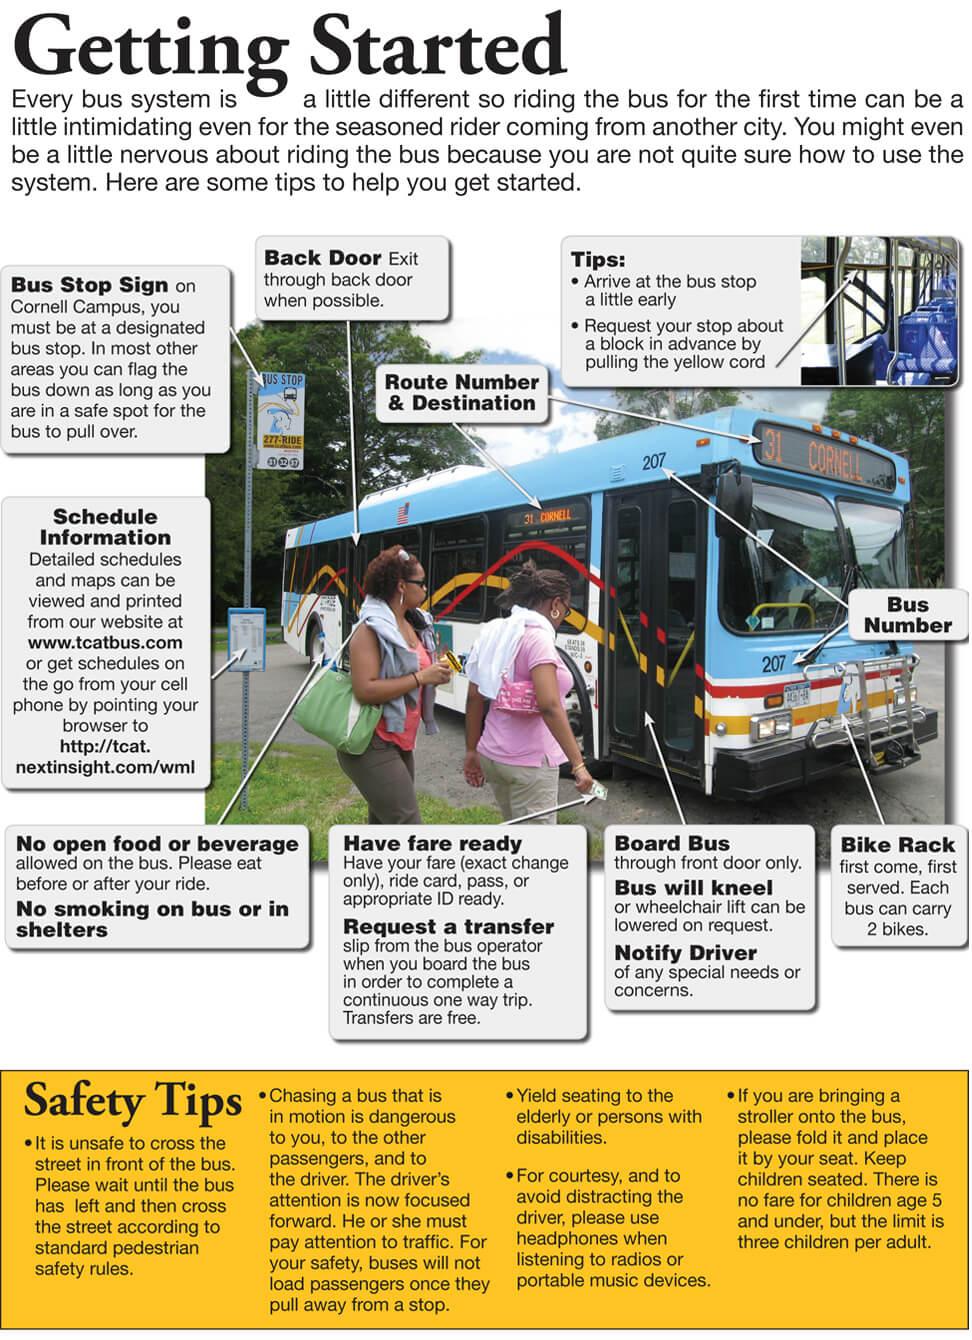 Ride Guide tip sheet